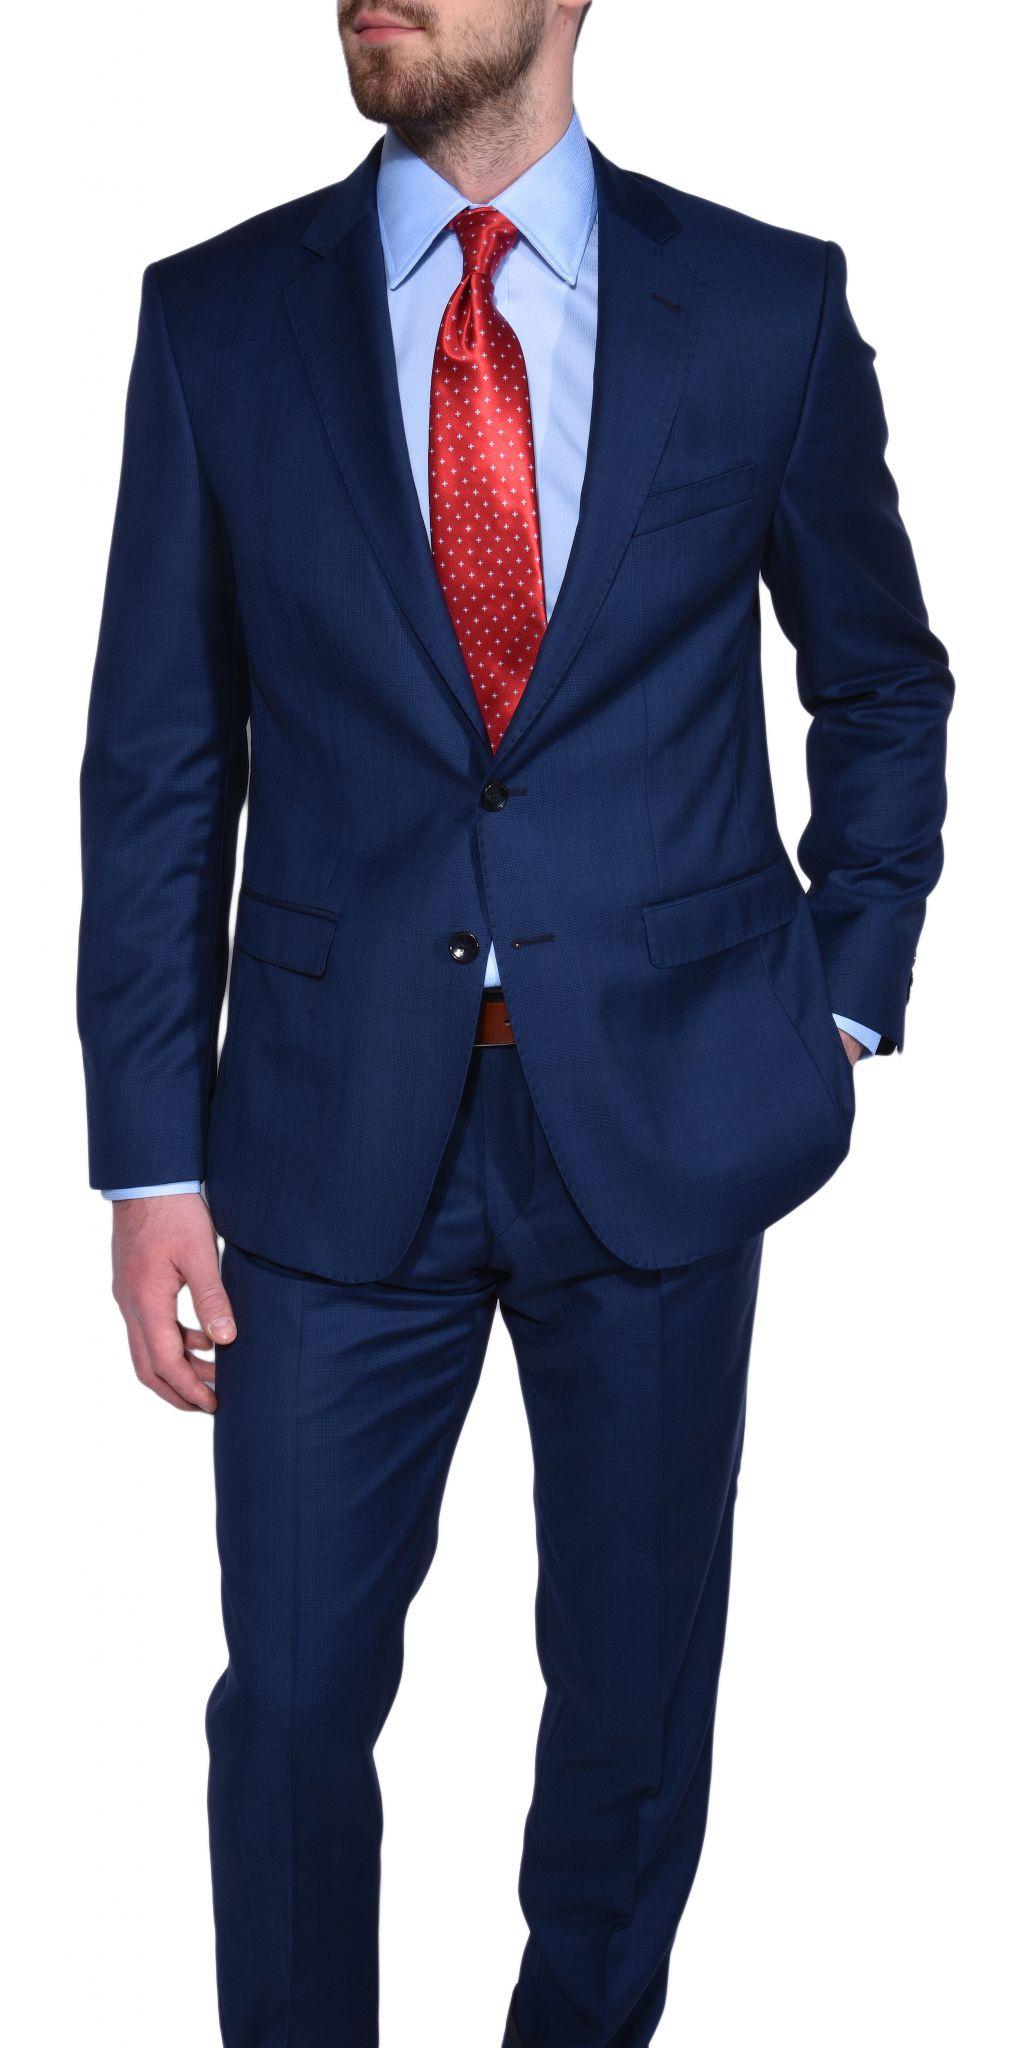 limited edition dark blue suit